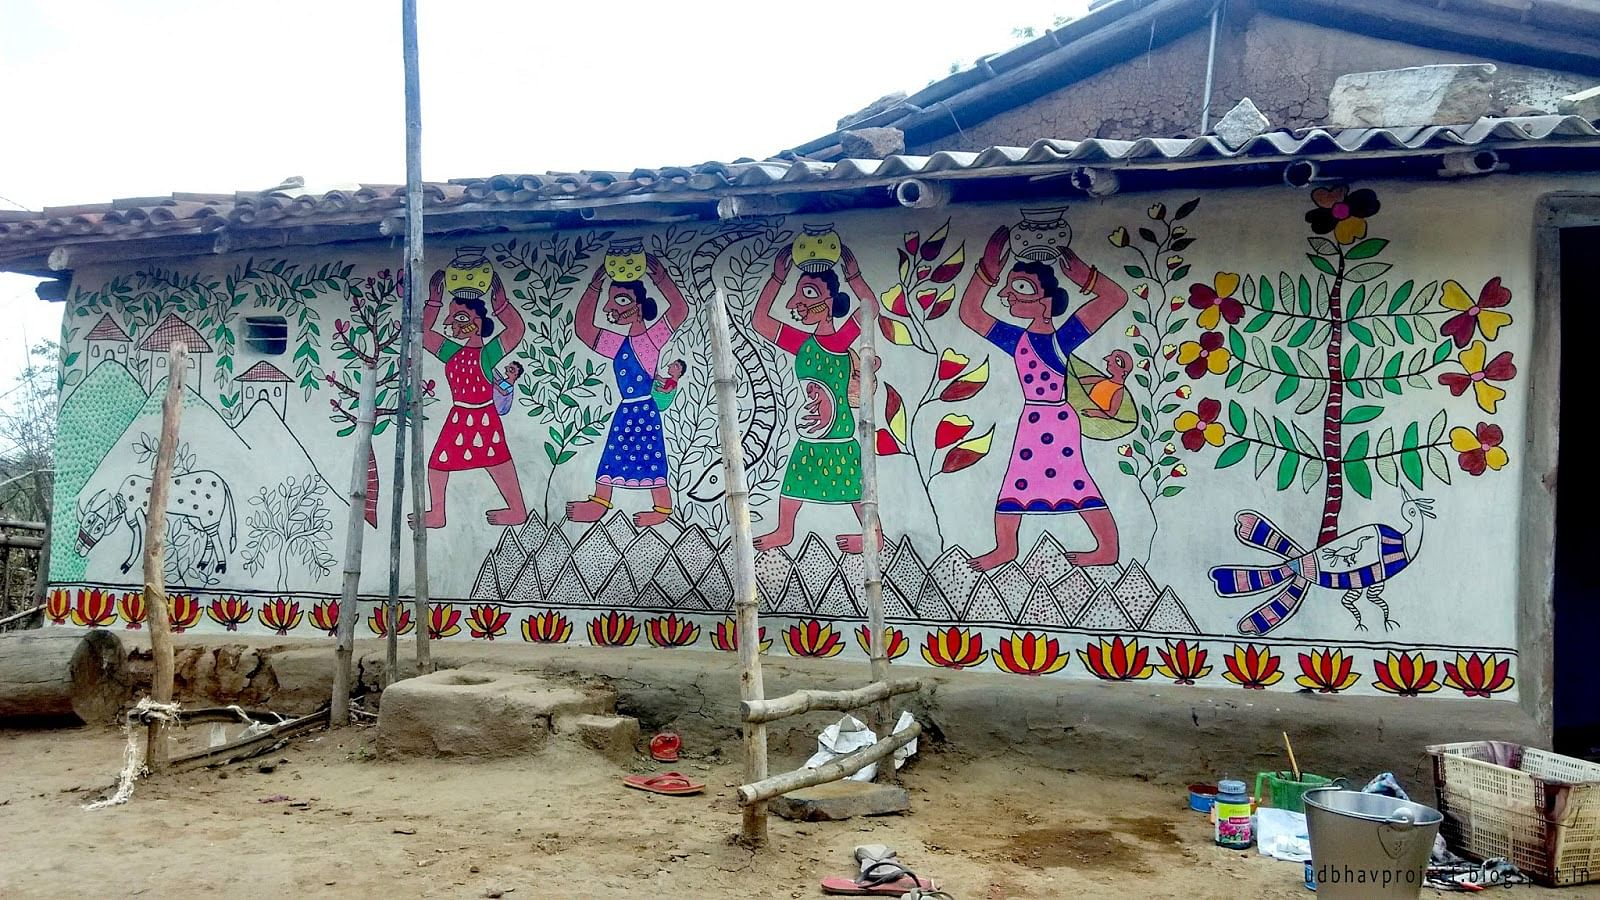 udbhavproject avinash karn artreach copy